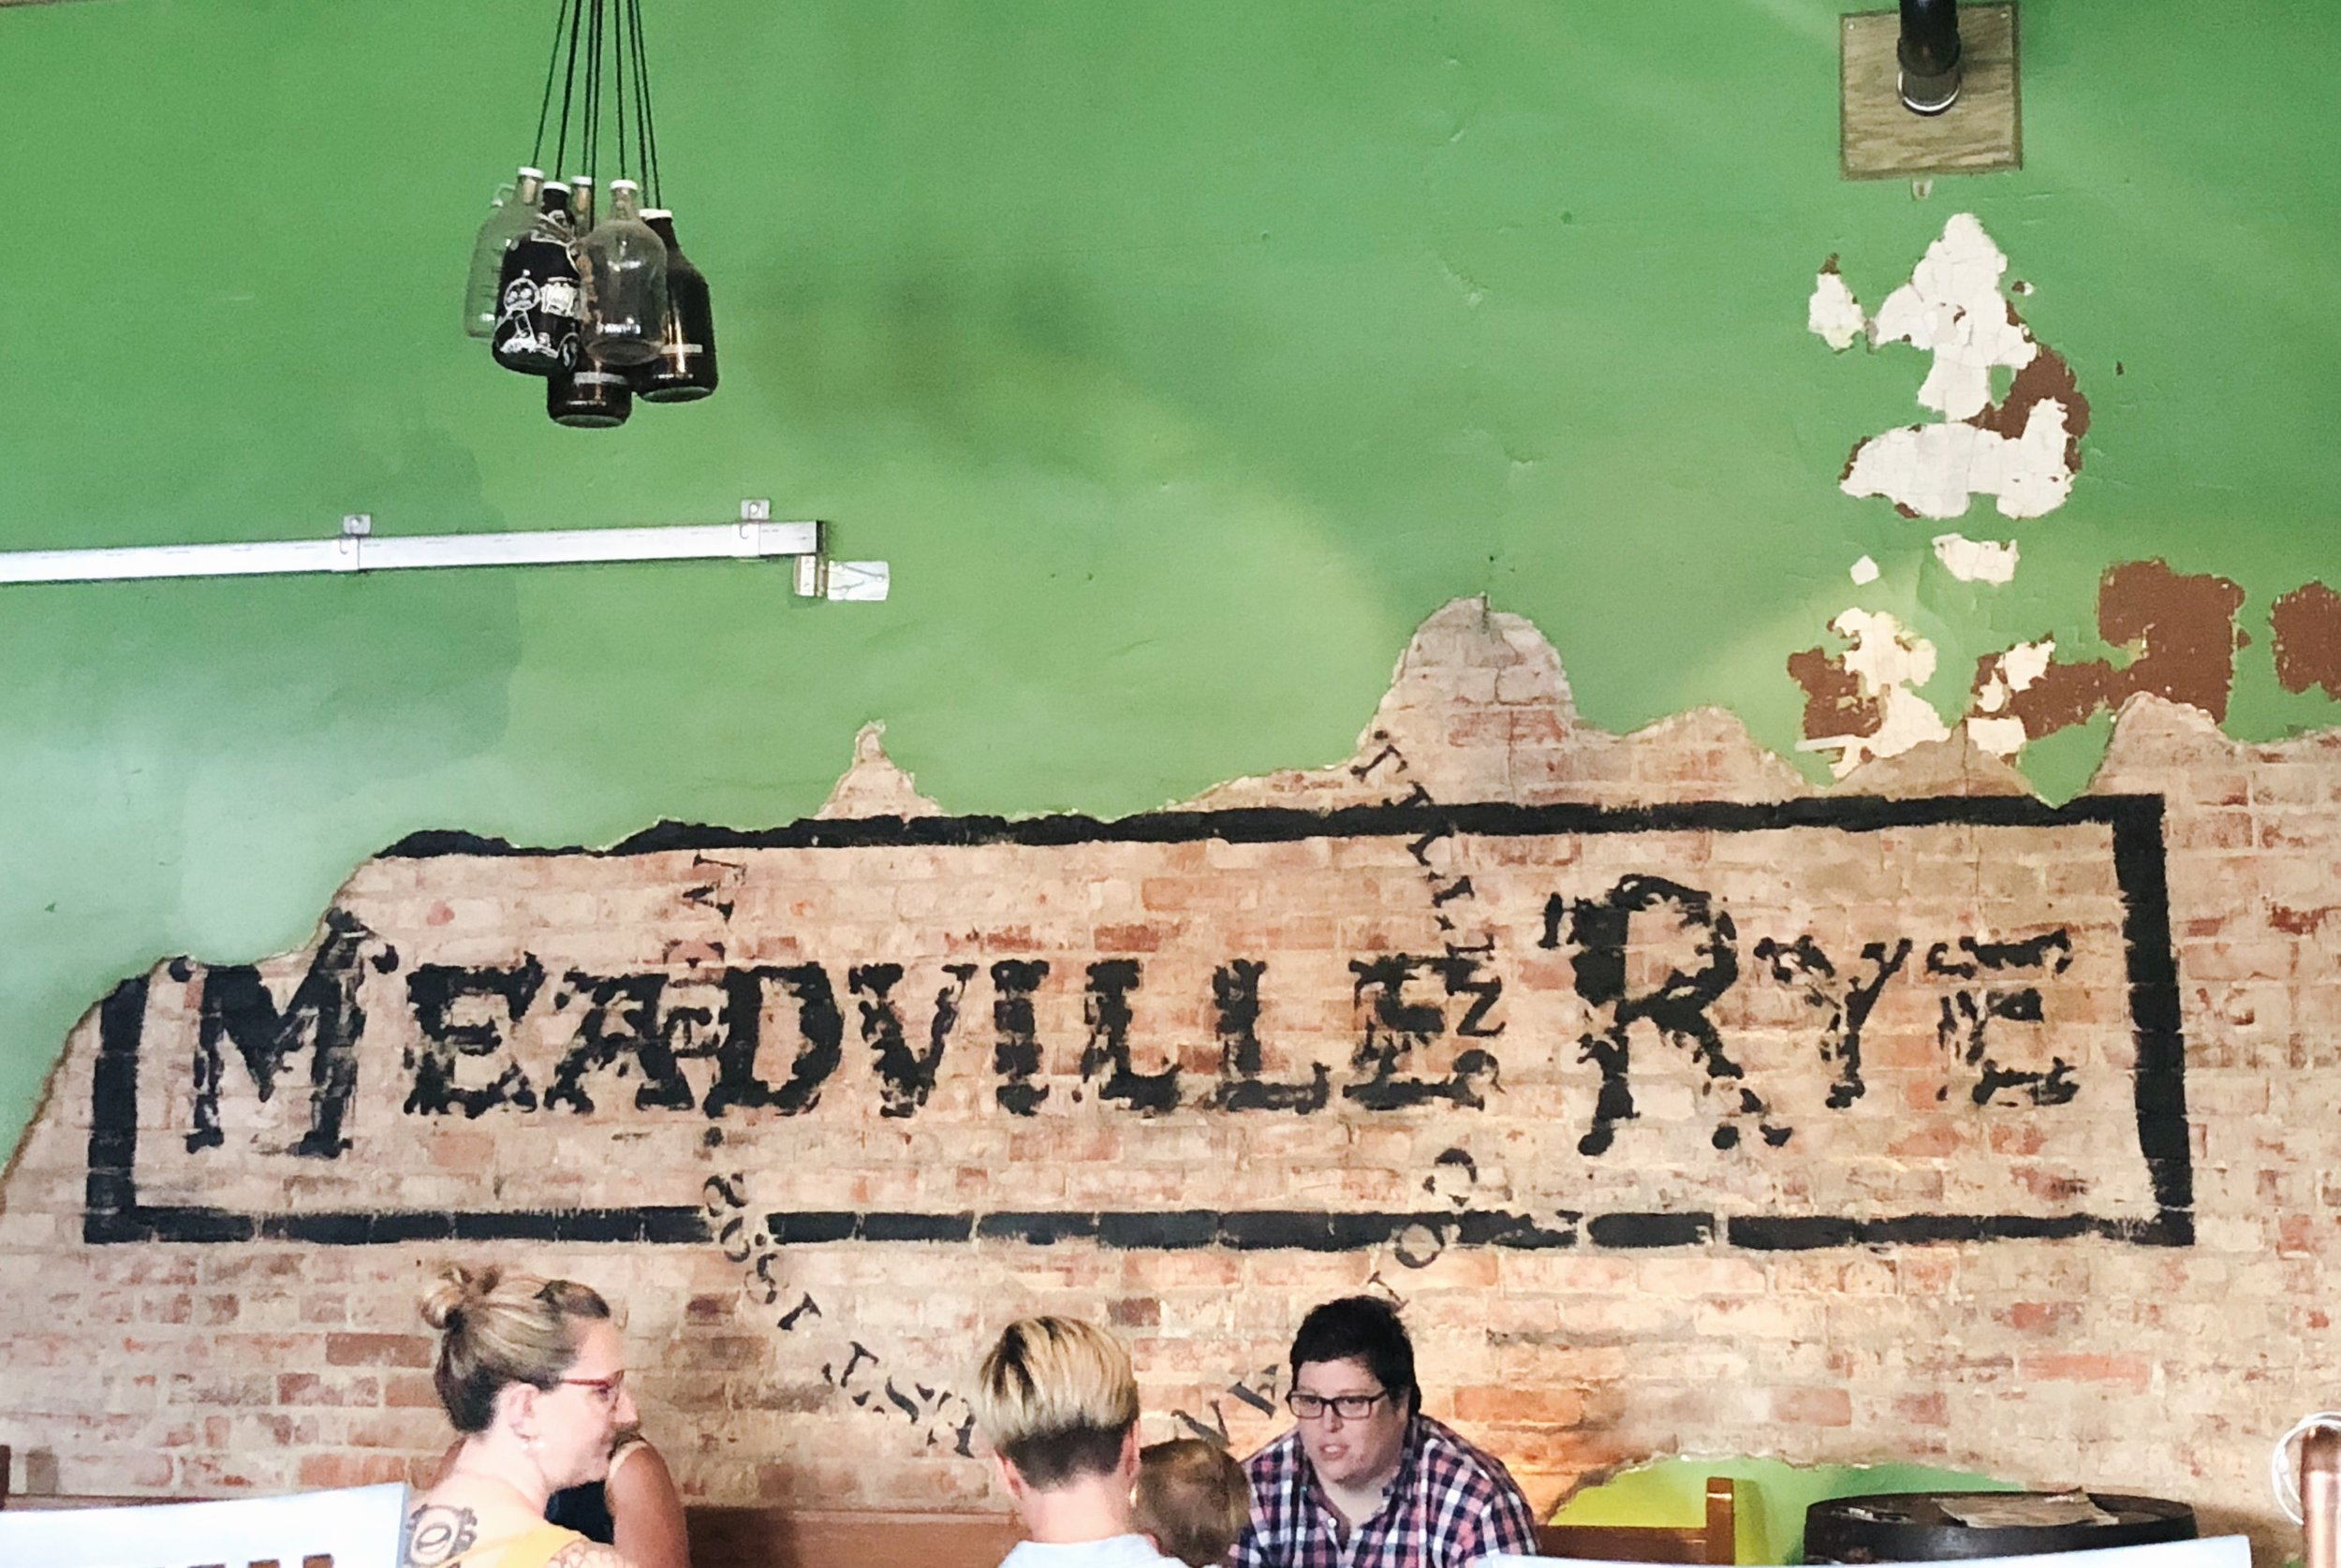 Voodoo Brewery Meadville, PA